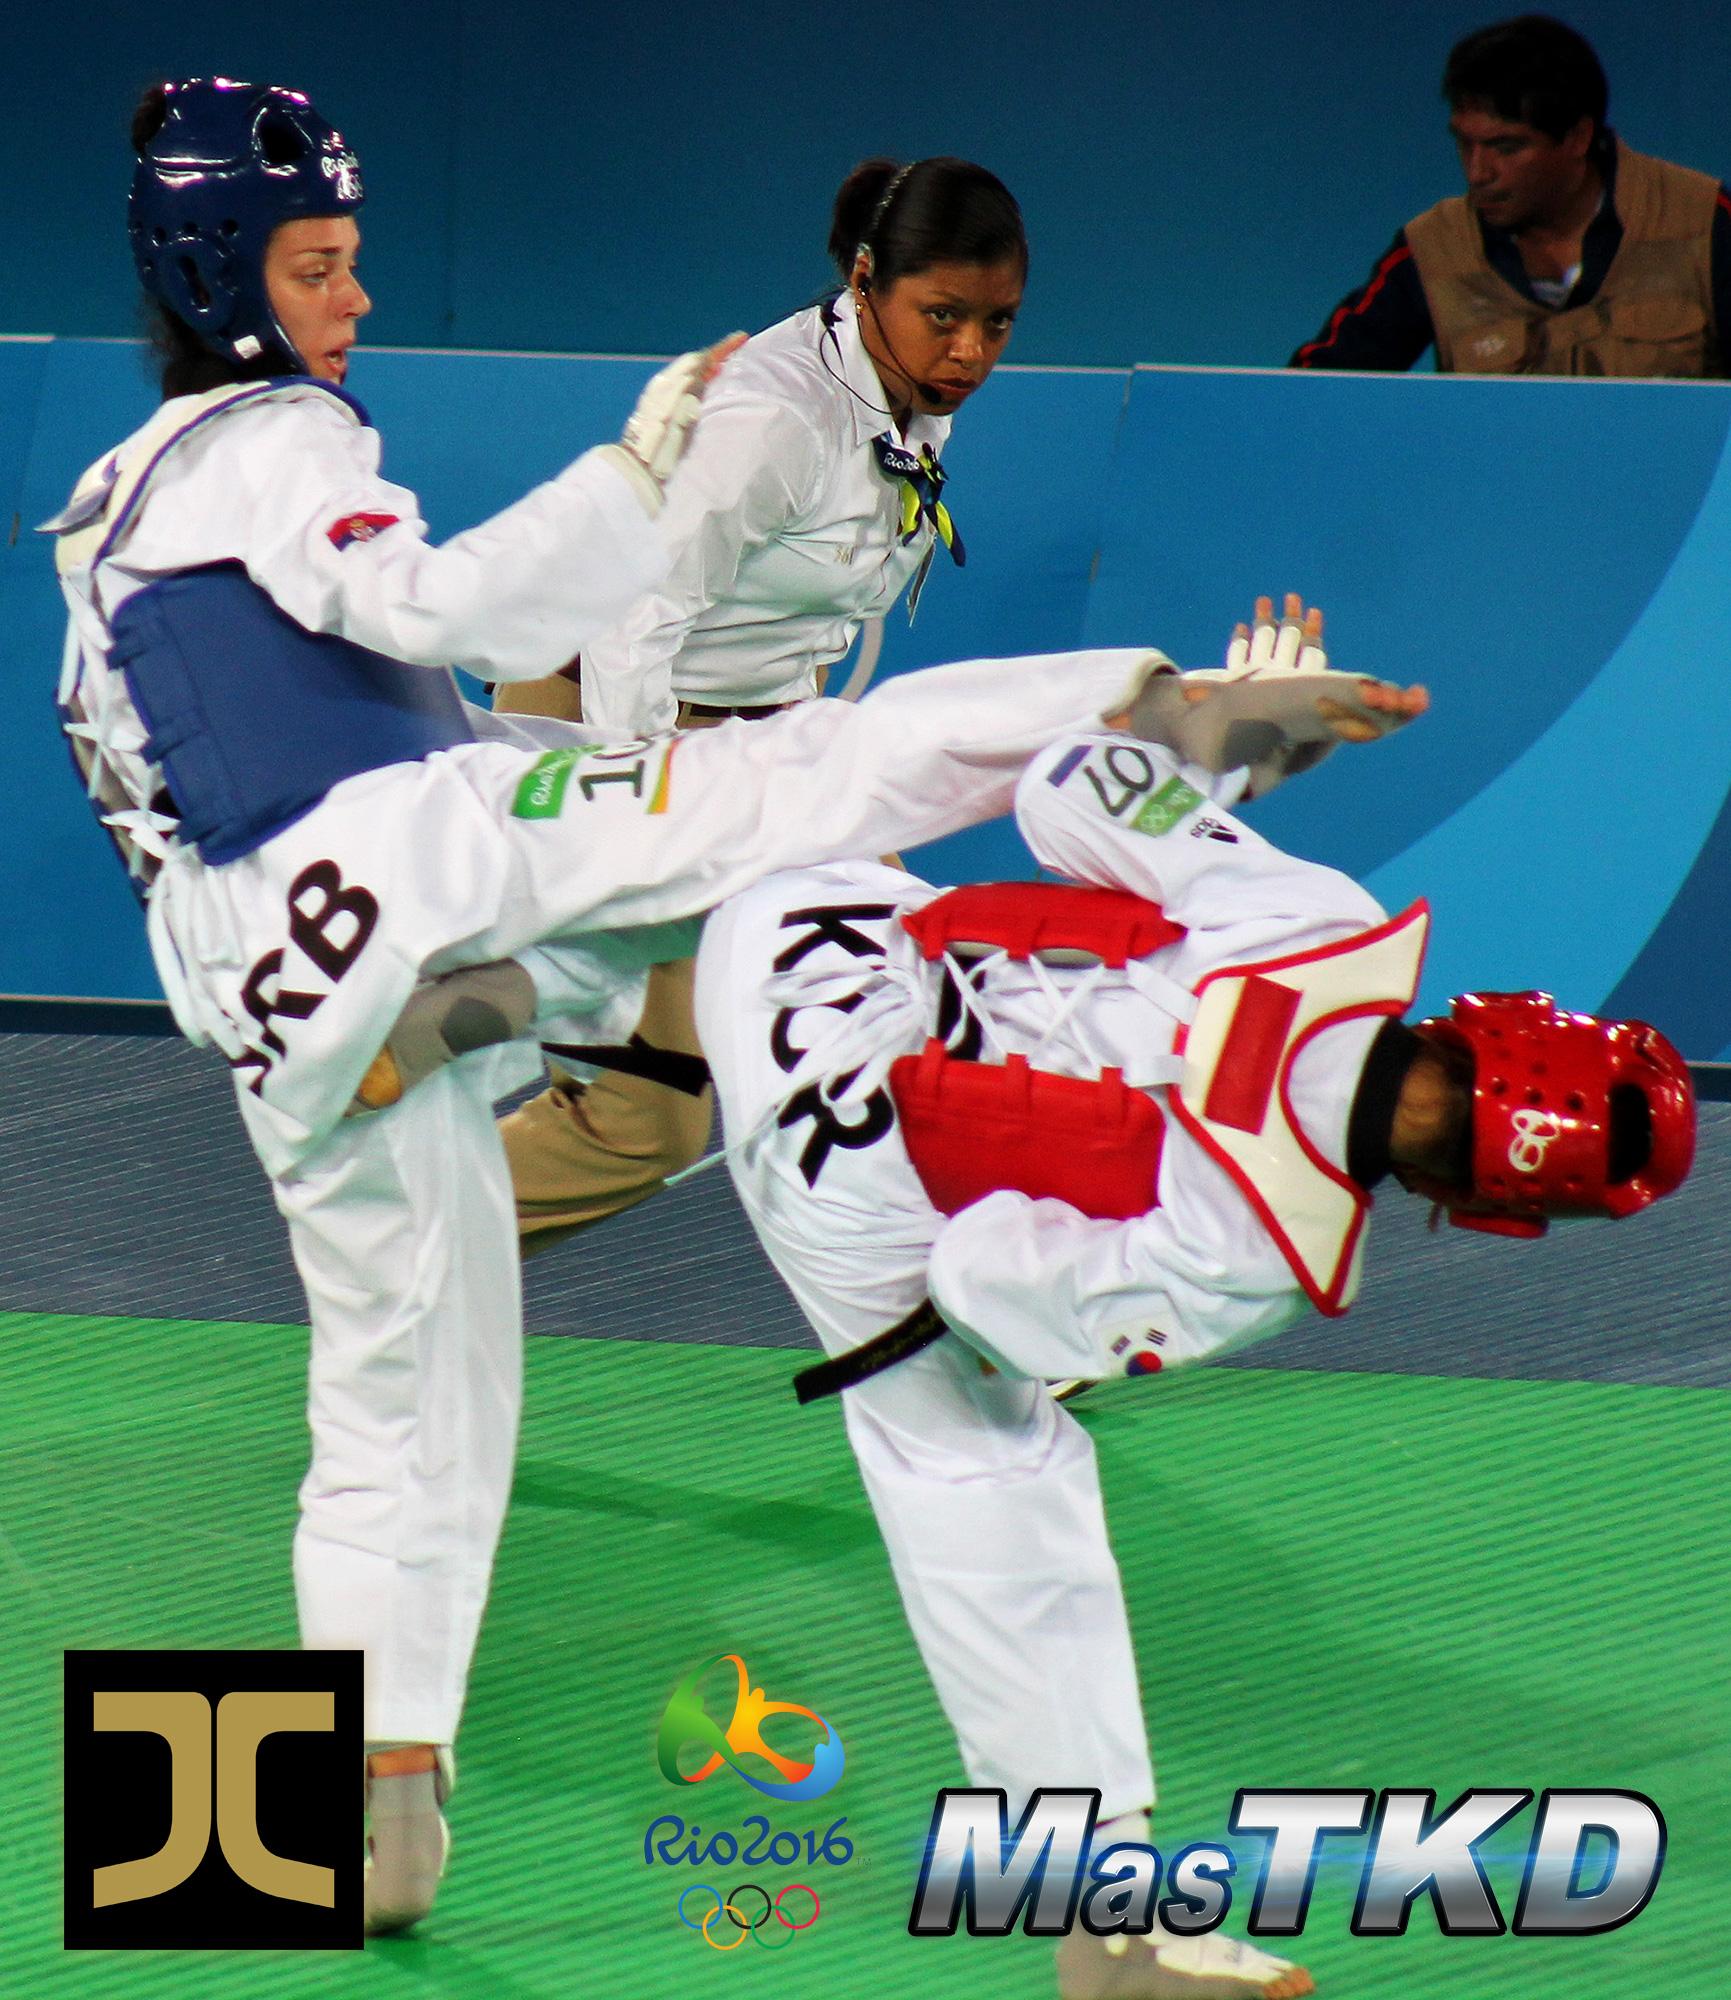 20160817_Taekwondo_JC_masTKD_Rio2016_05